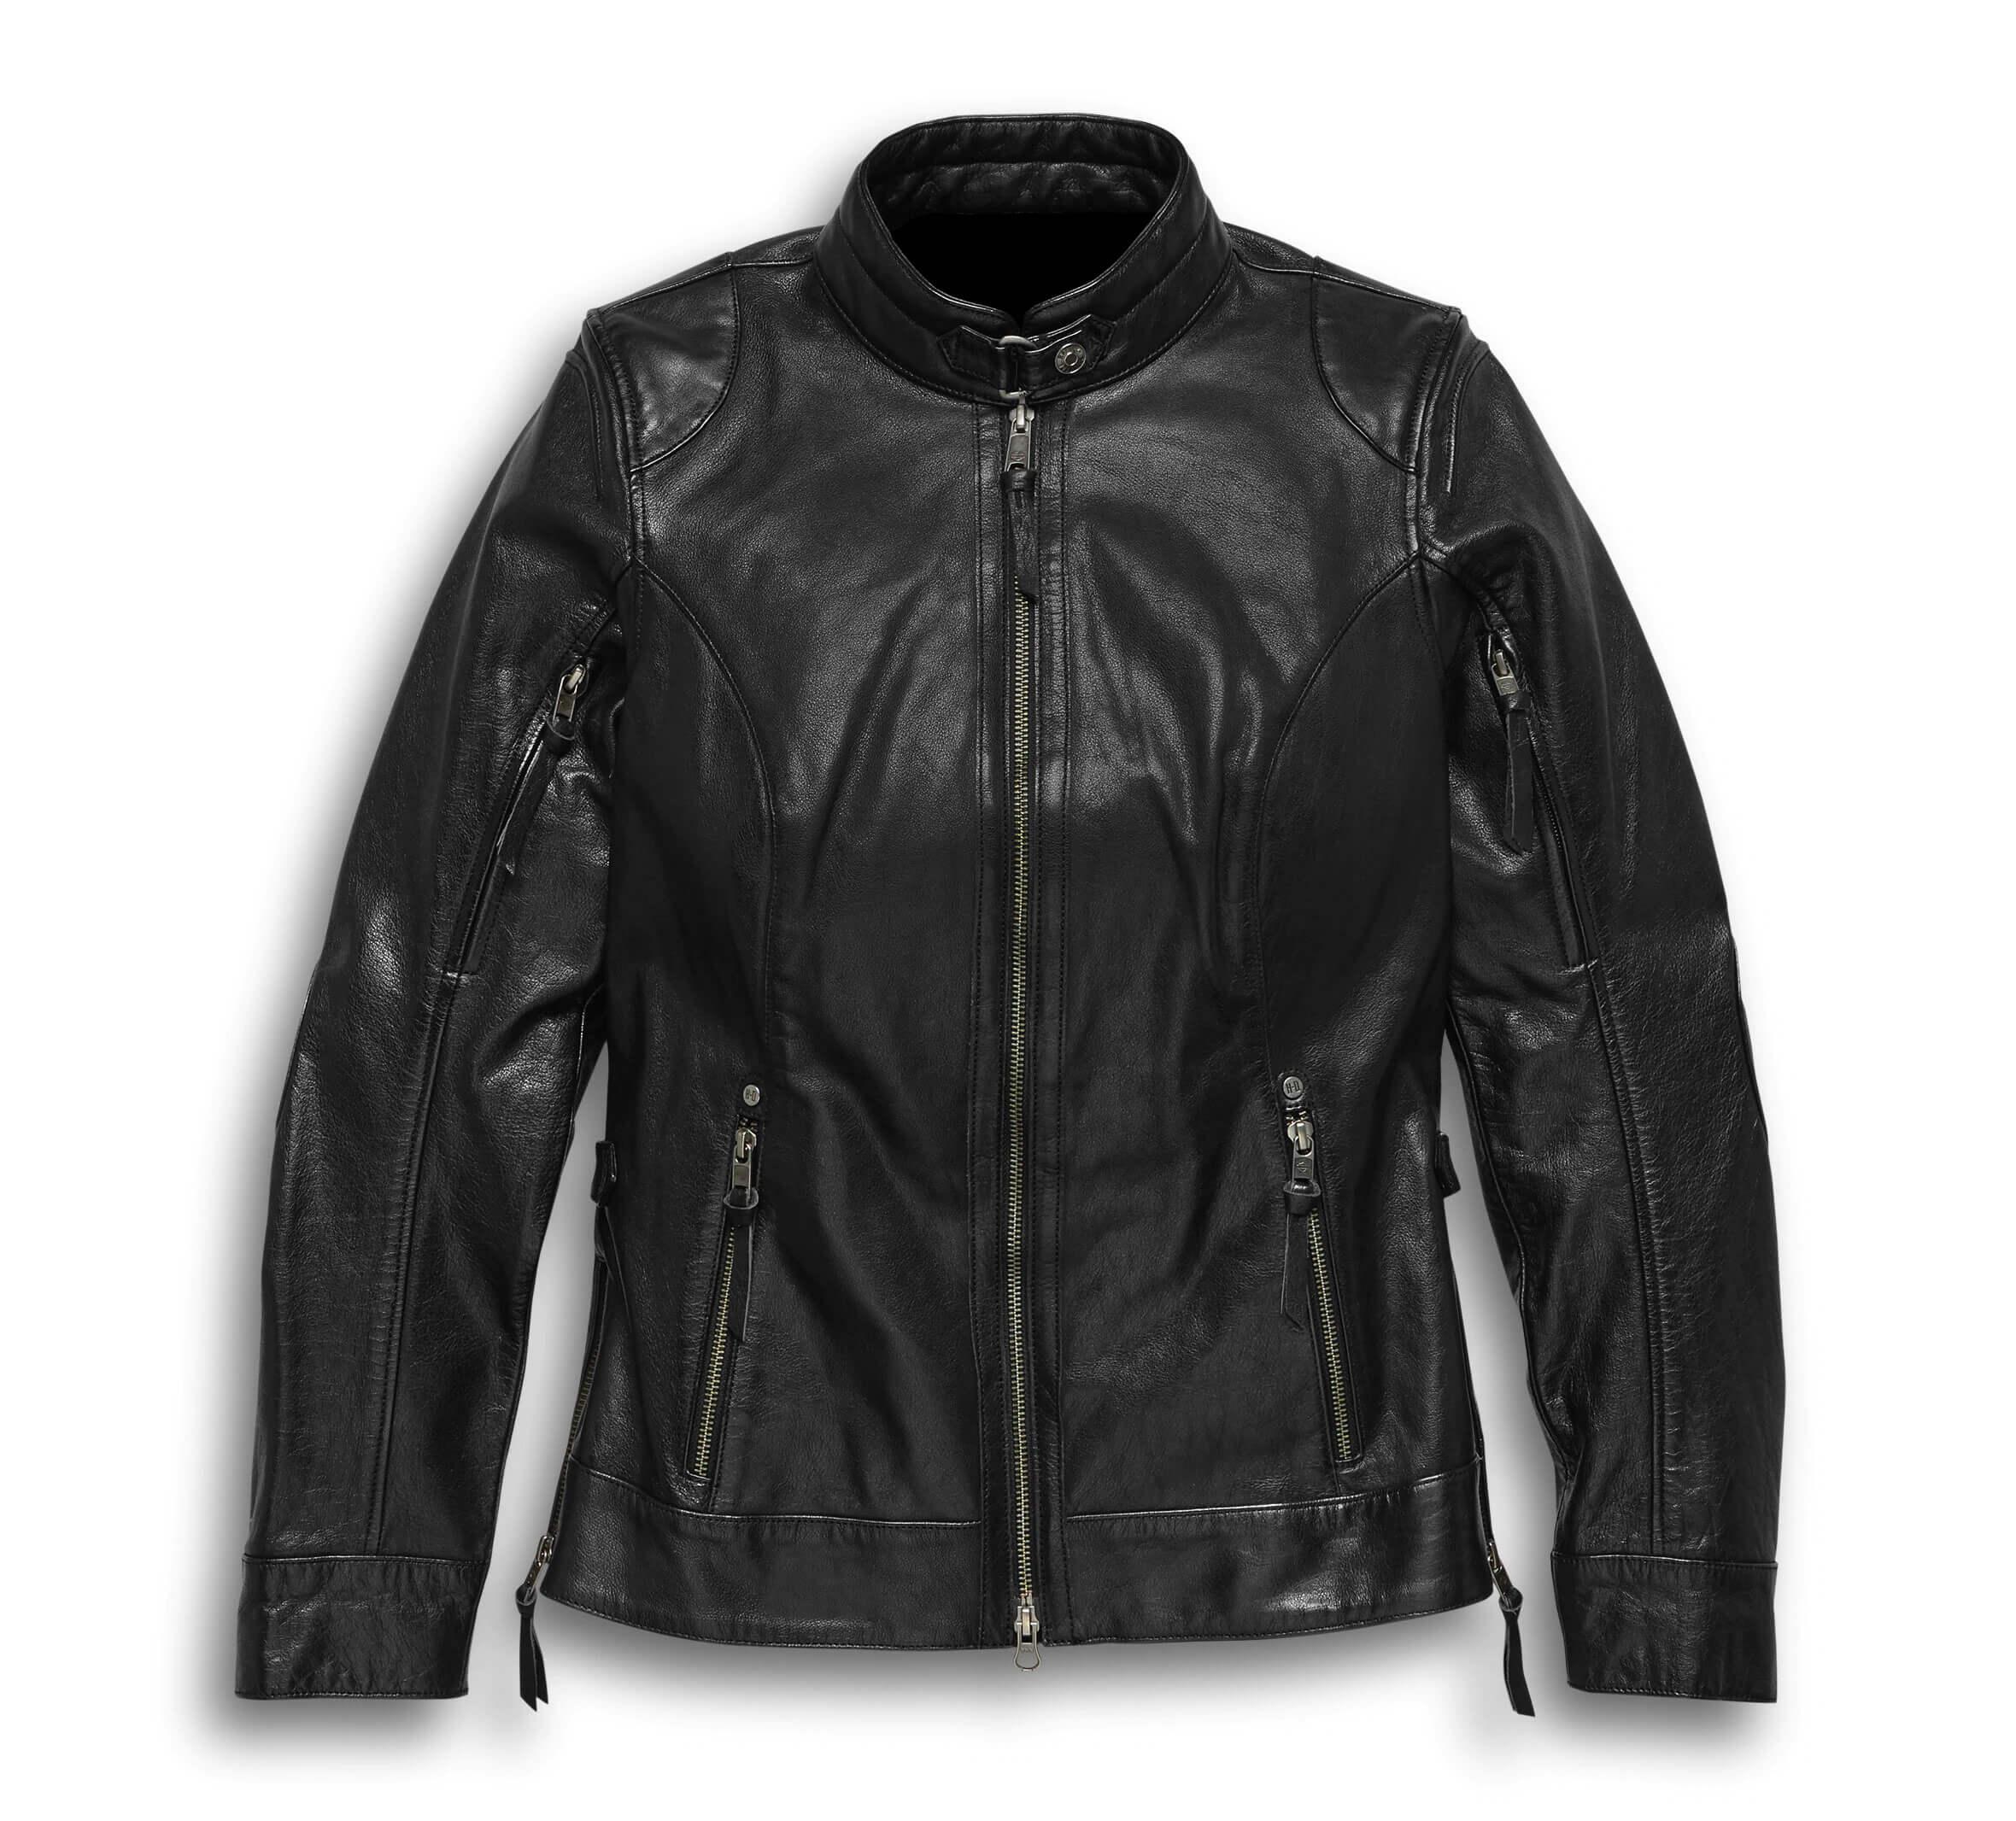 Motorcycle Harley Davidson Black Leather Jacket